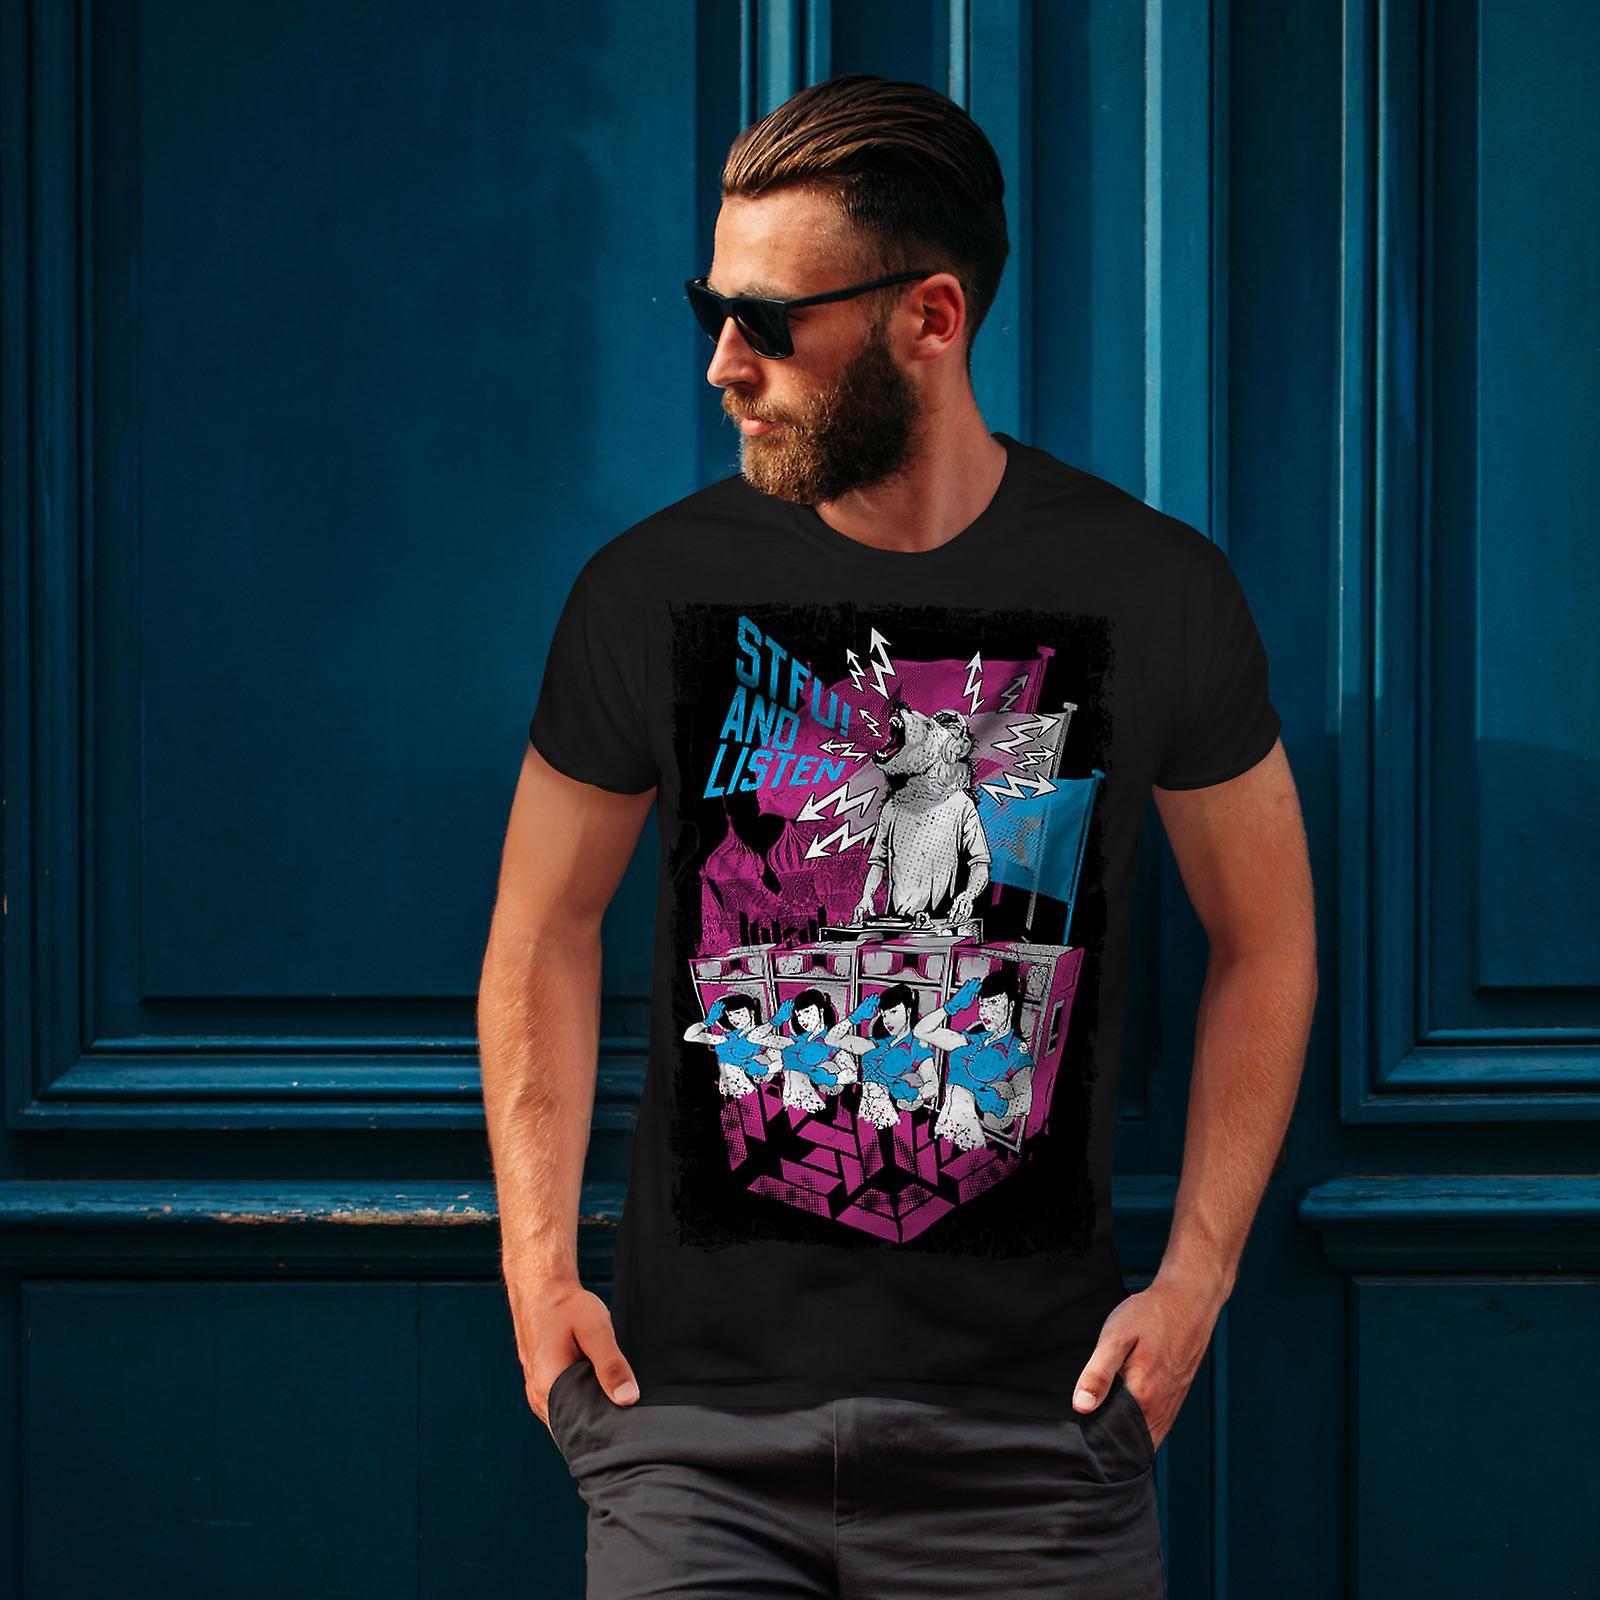 STFU Listen Dance muziek mannen gekleedinzwartet-shirt | Wellcoda